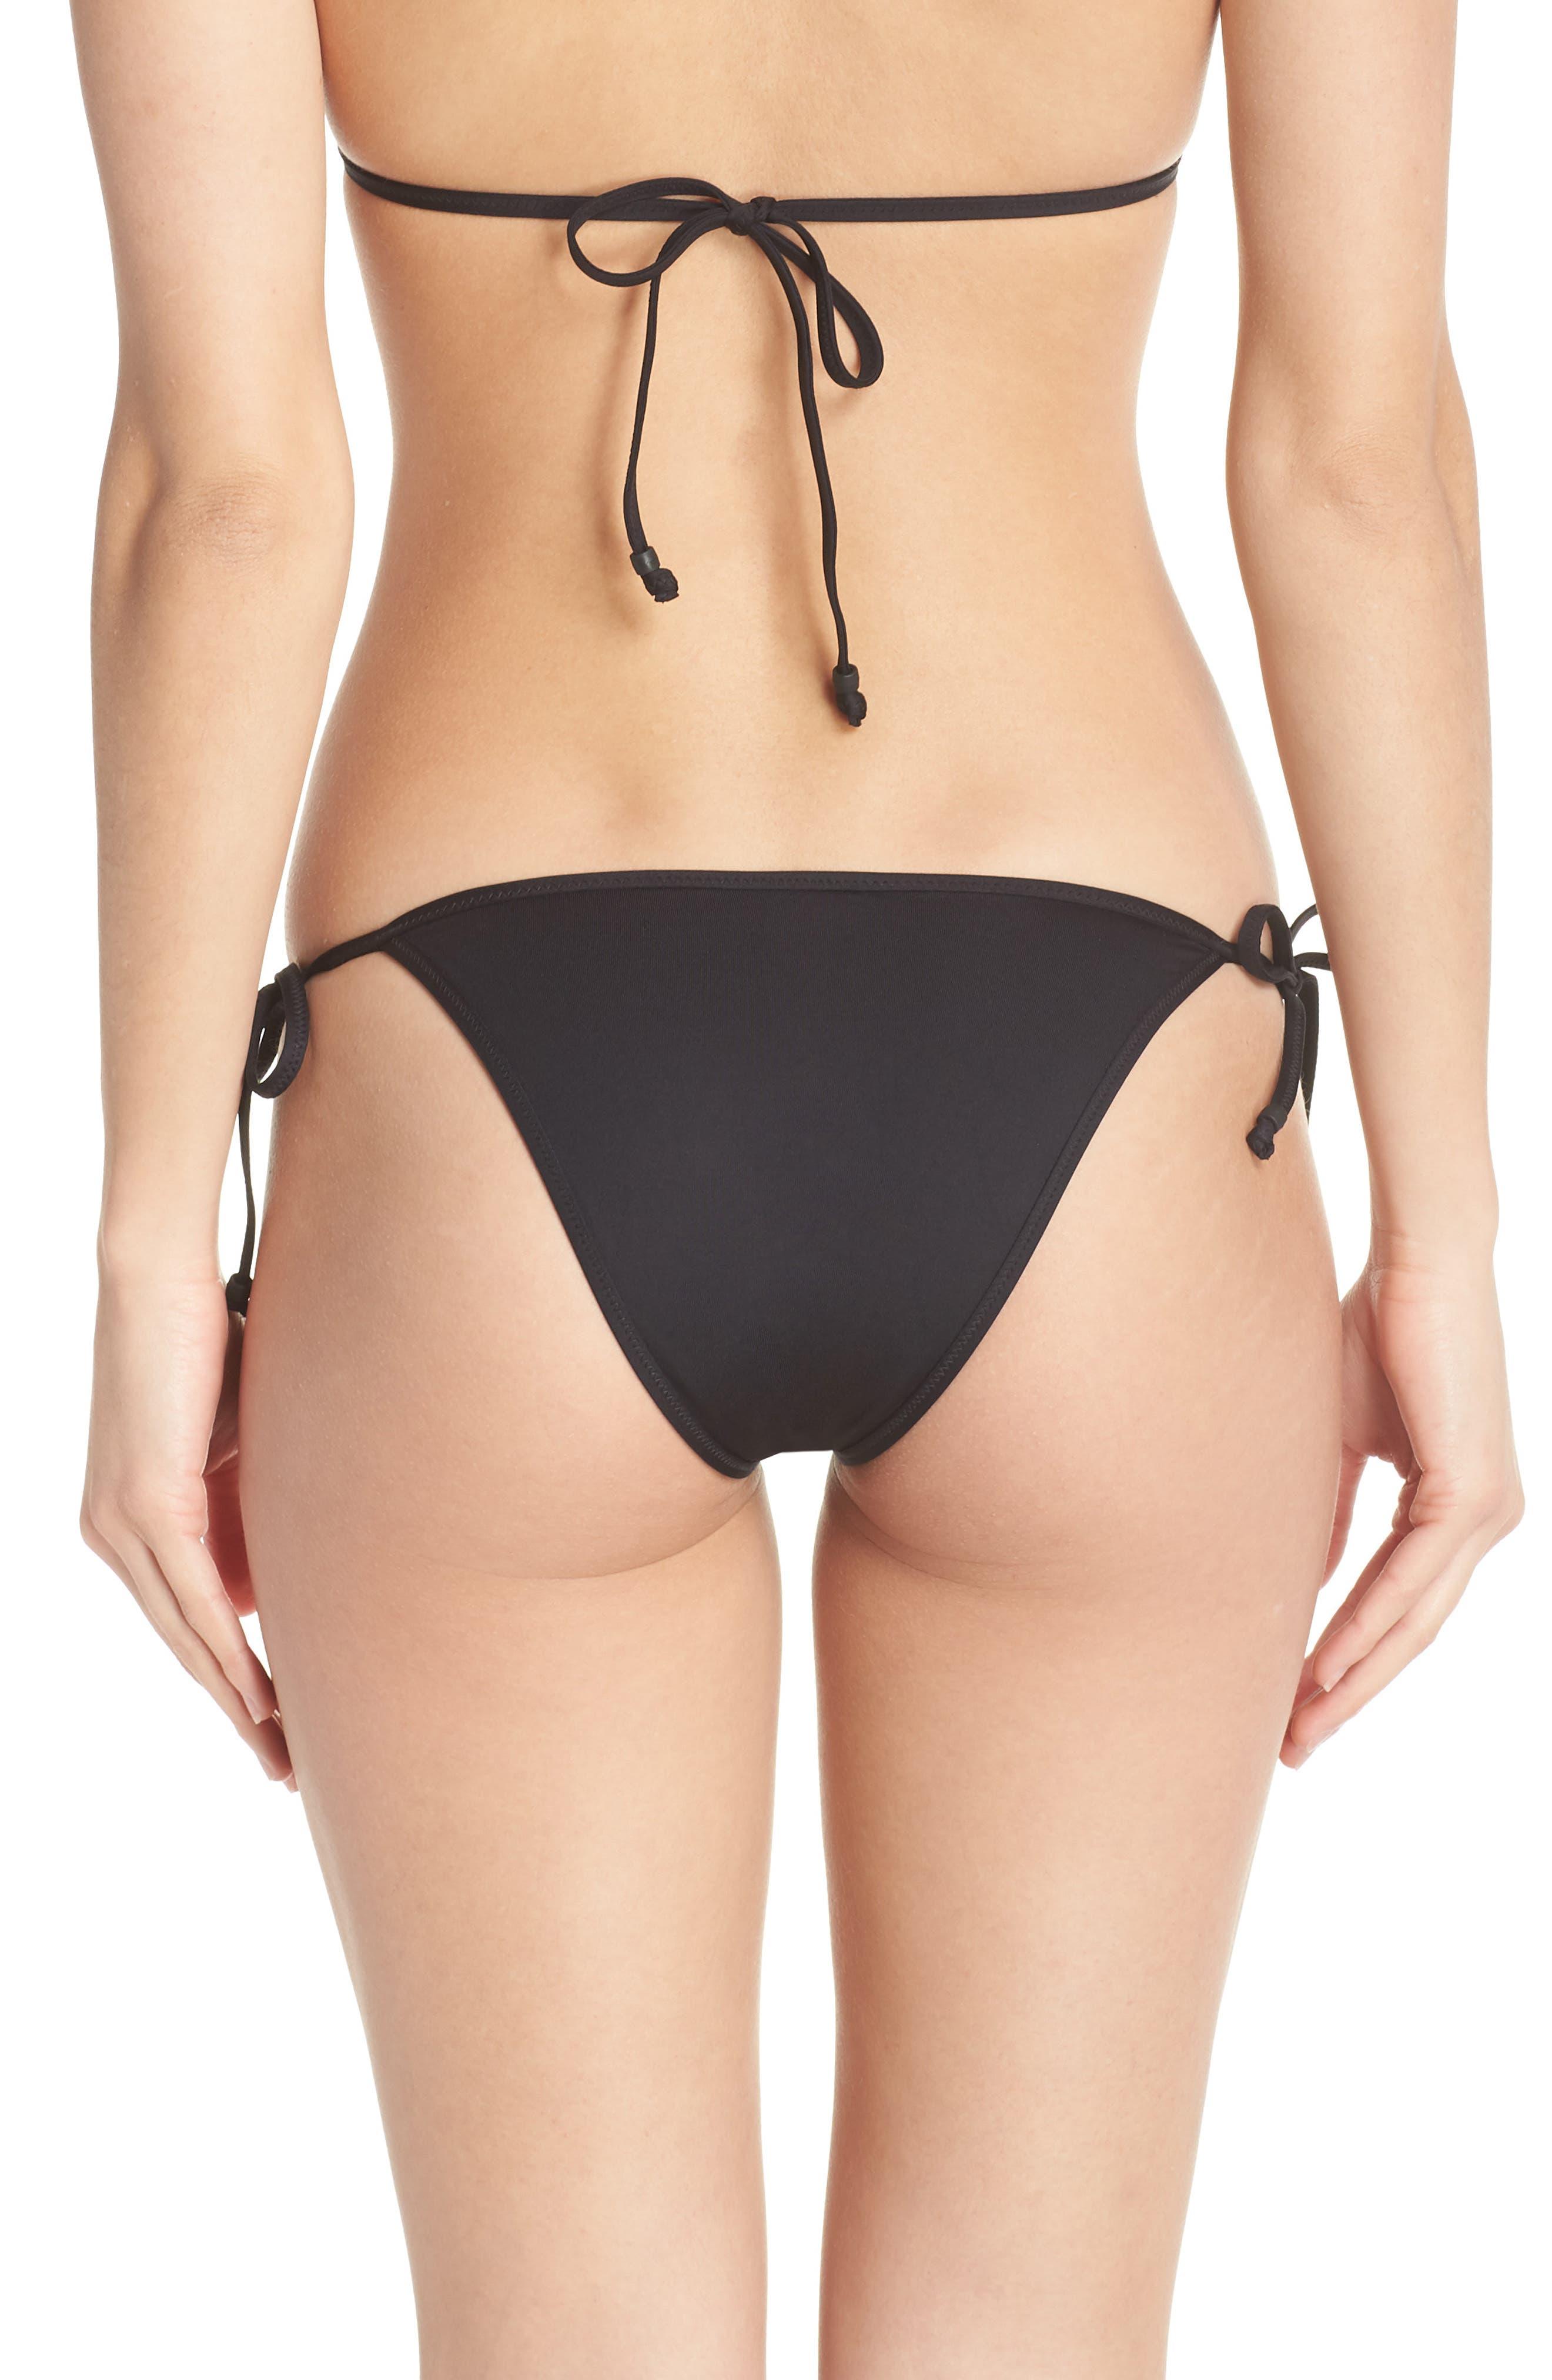 Playa Miami String Bikini Bottoms,                             Alternate thumbnail 2, color,                             001